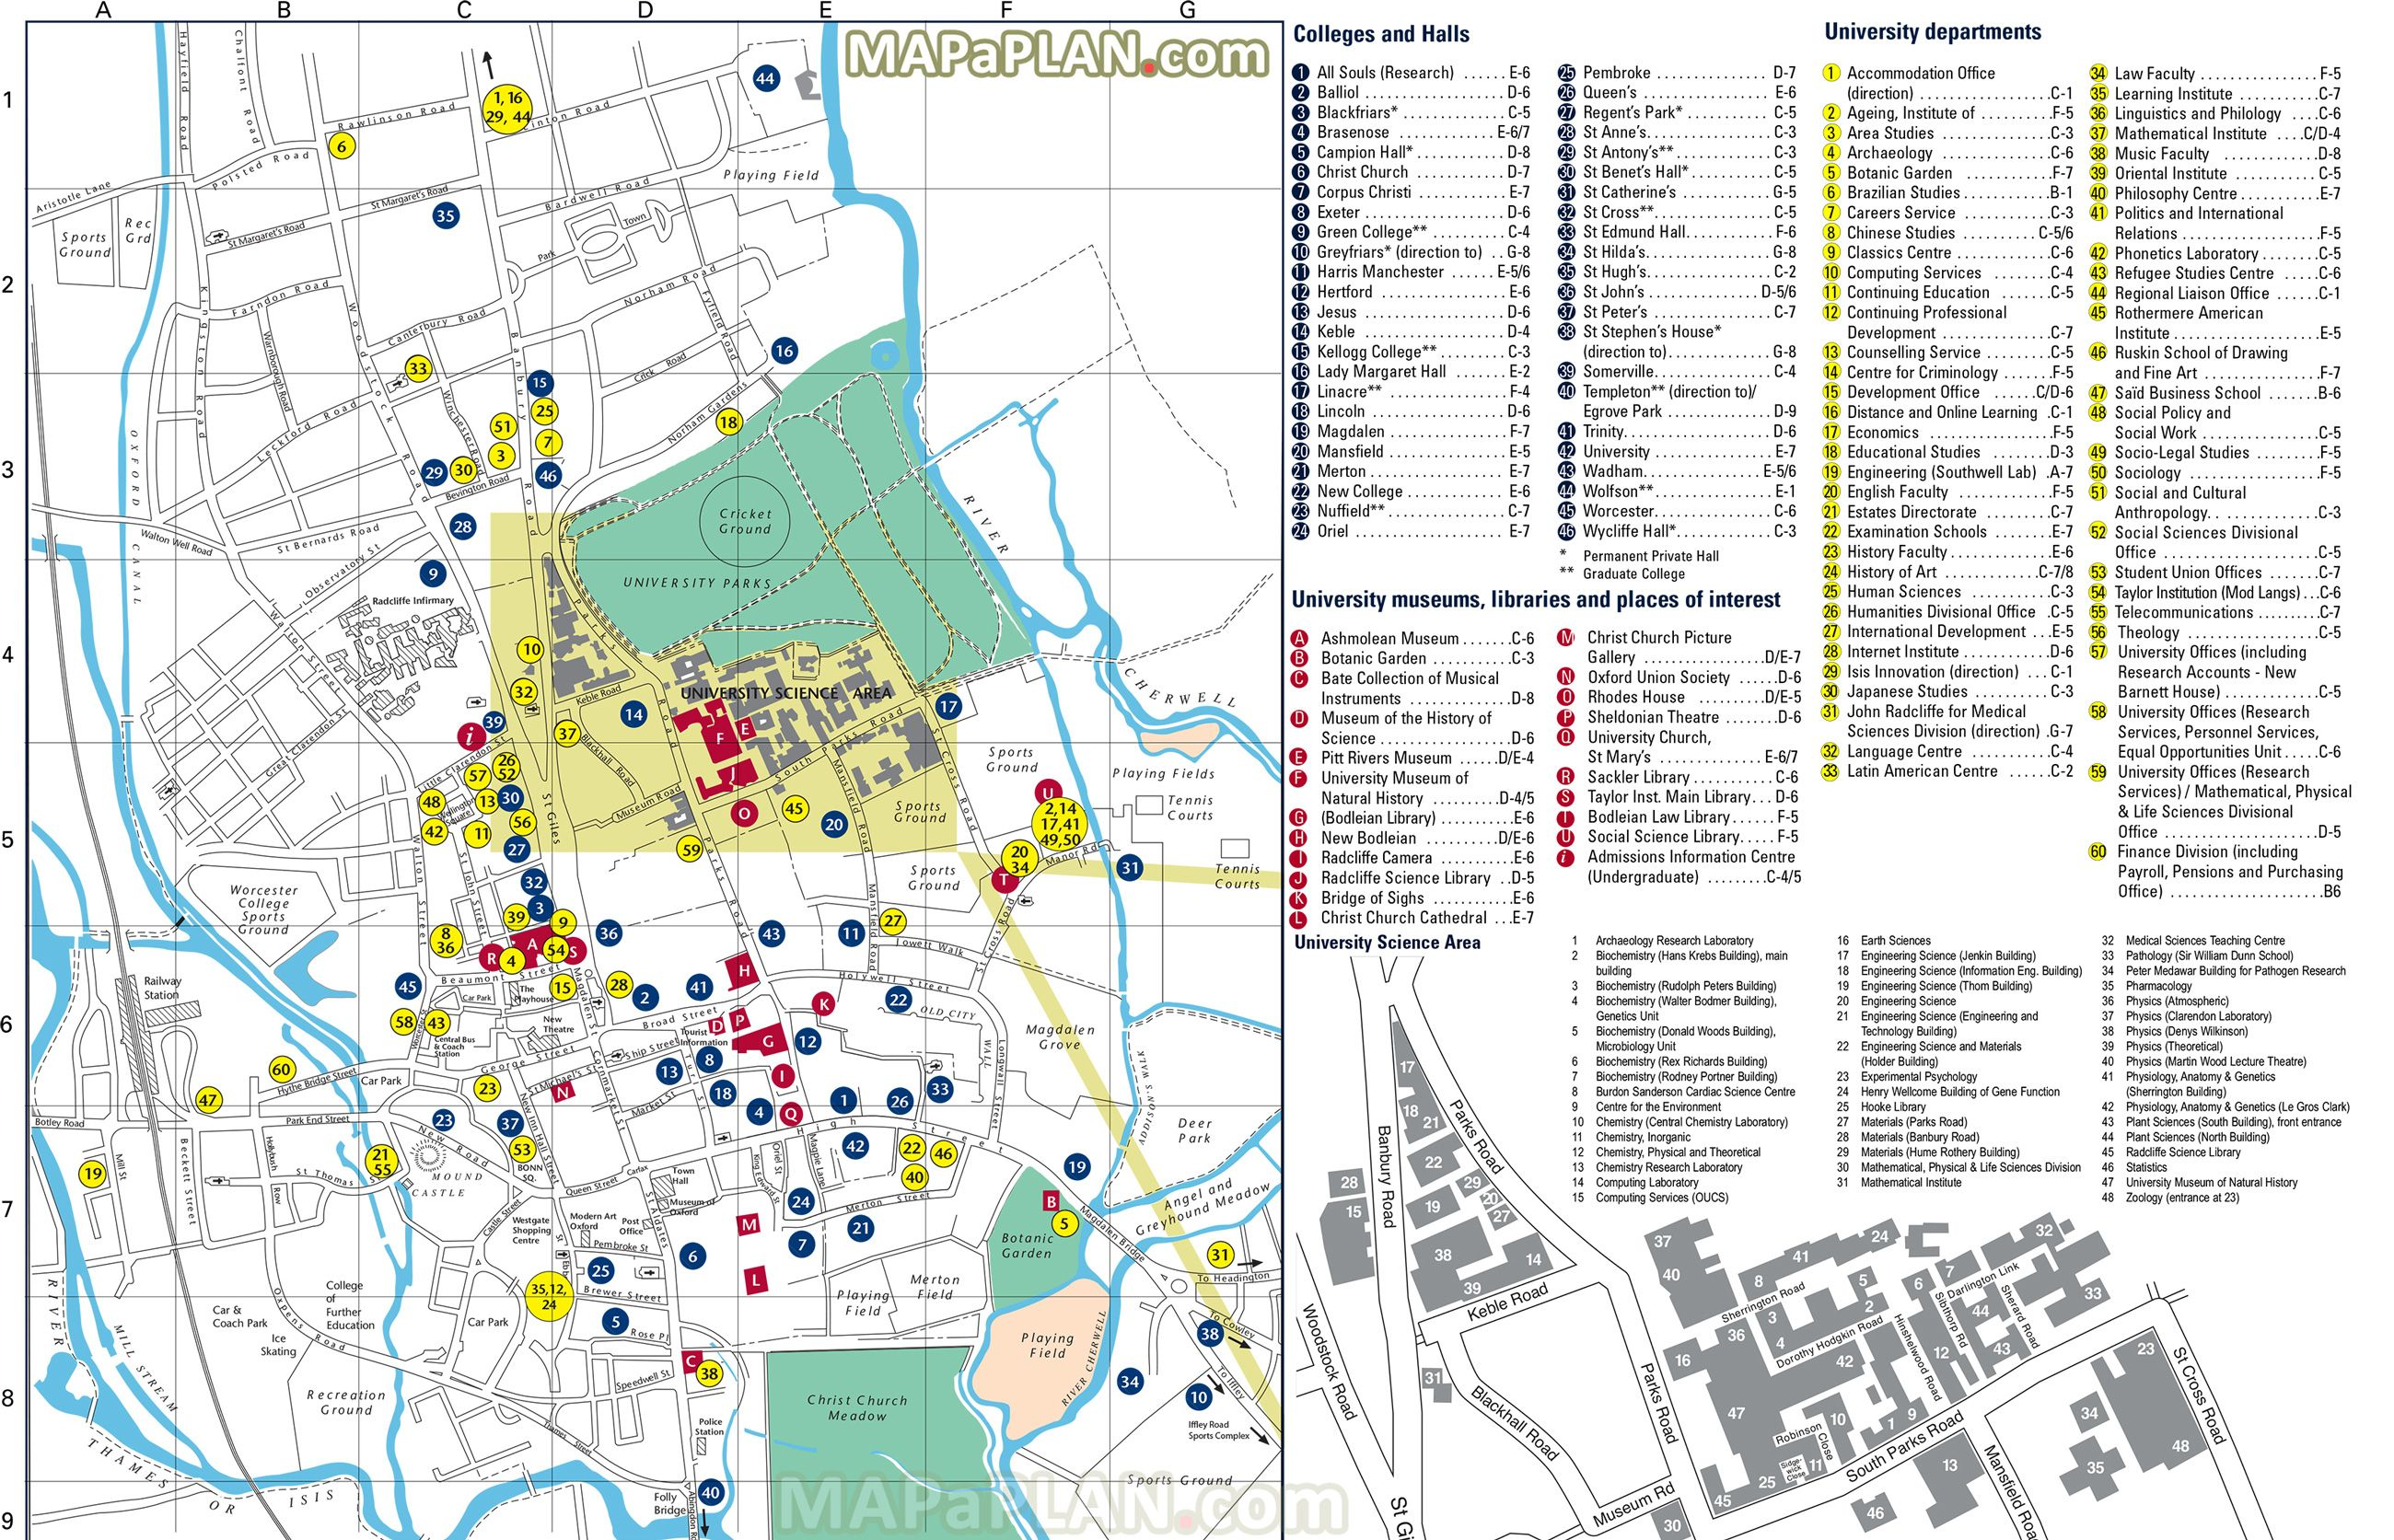 oxfordtoptouristattractionsmap03OxfordUniversityNatural